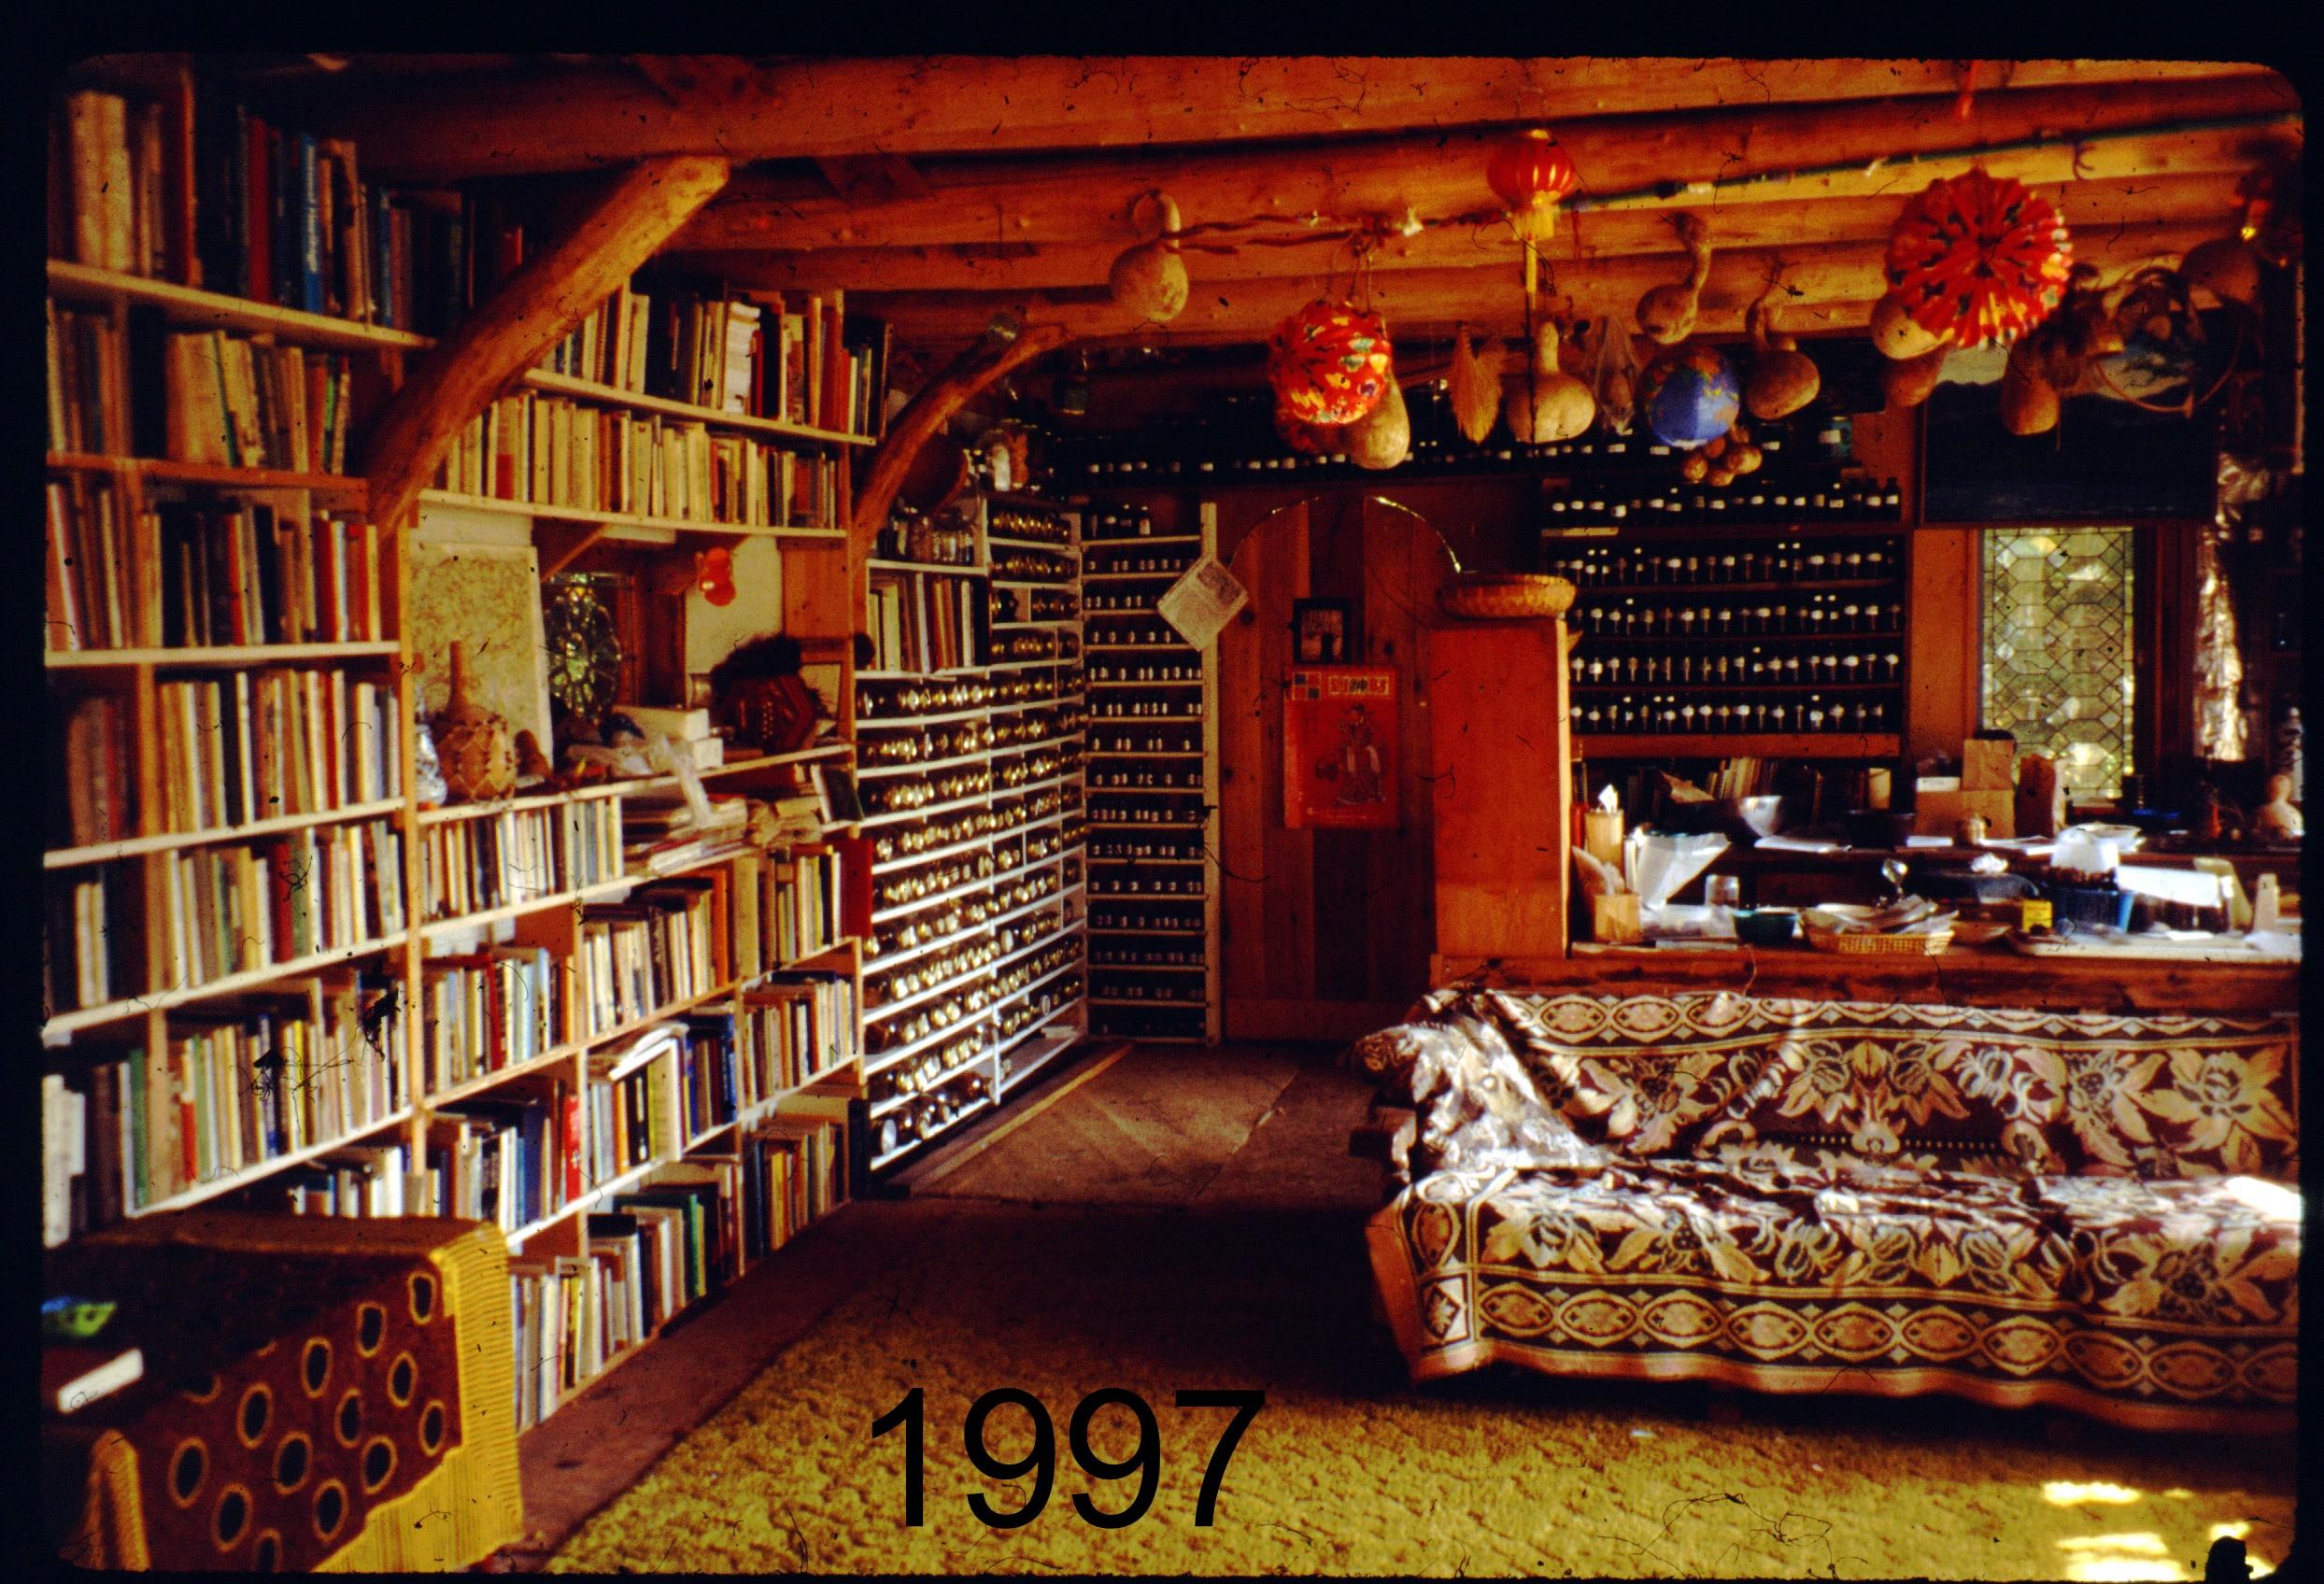 1997 pavi interior1l.jpg